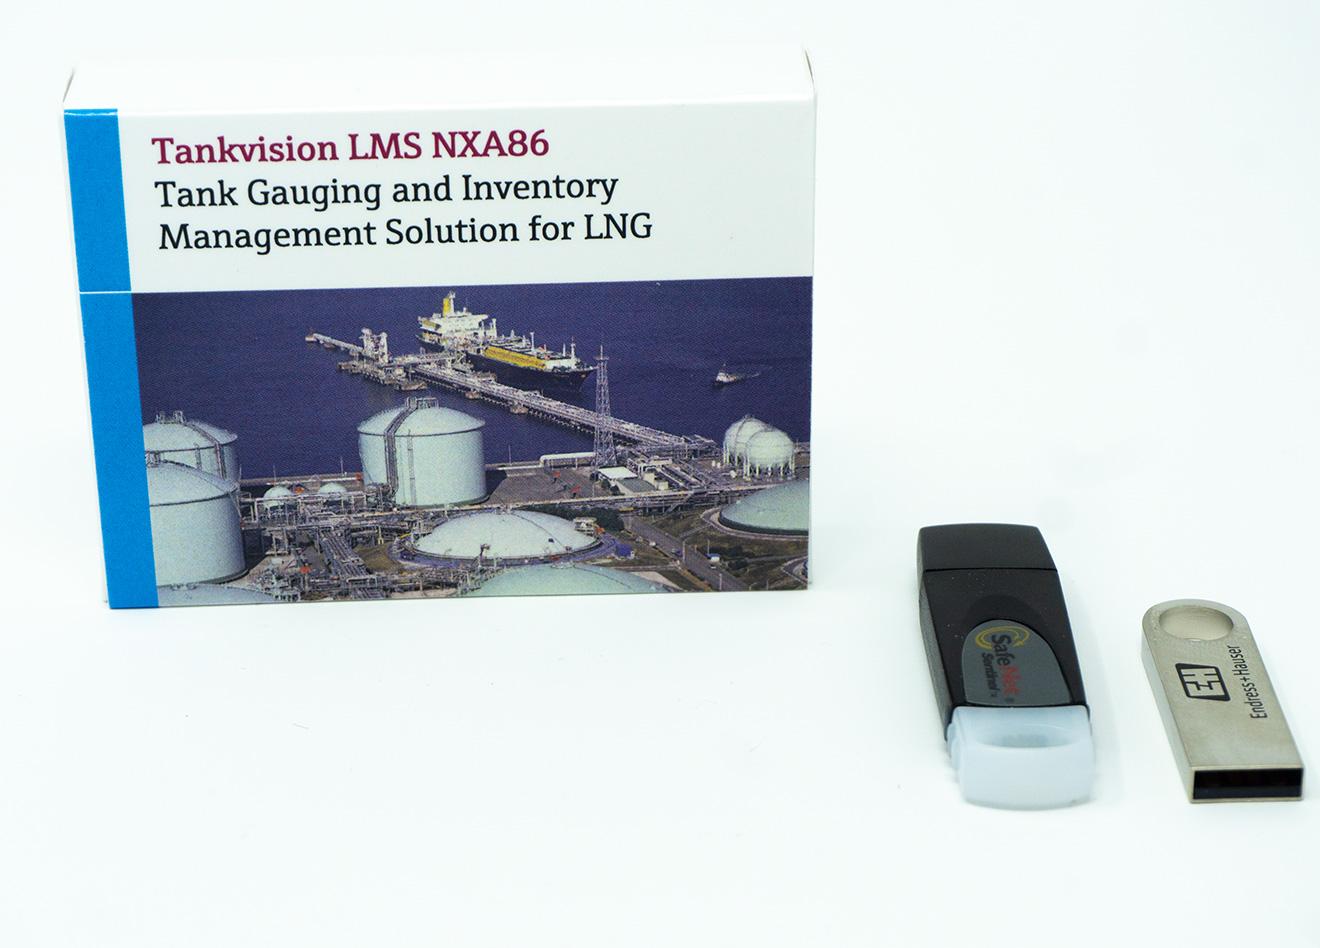 Software Box for Tankvision LMS NXA86